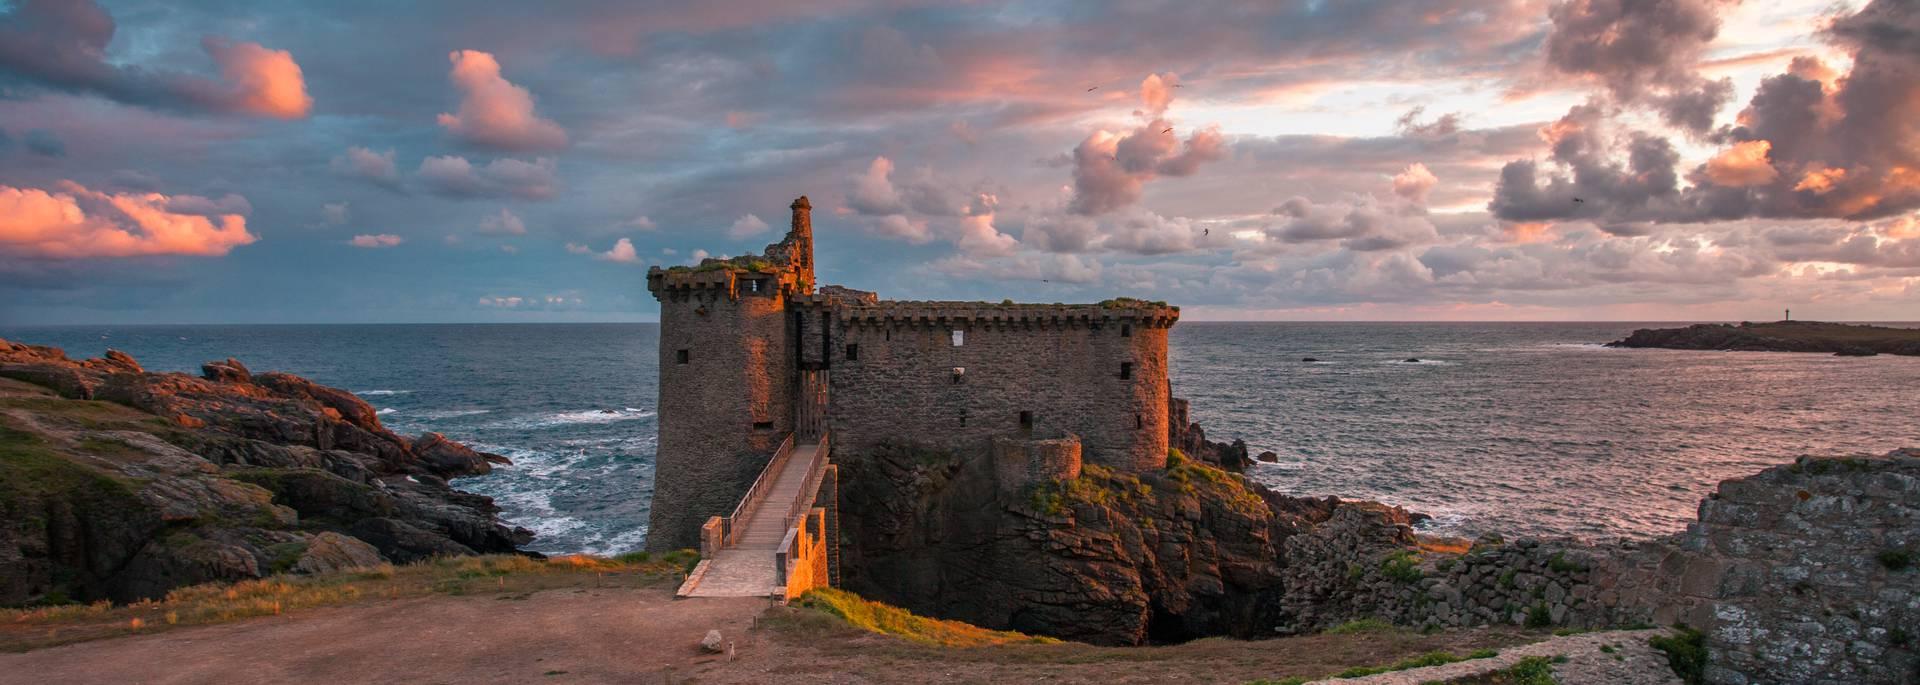 Die Alte Festung © R. Laurent / OT île d'Yeu